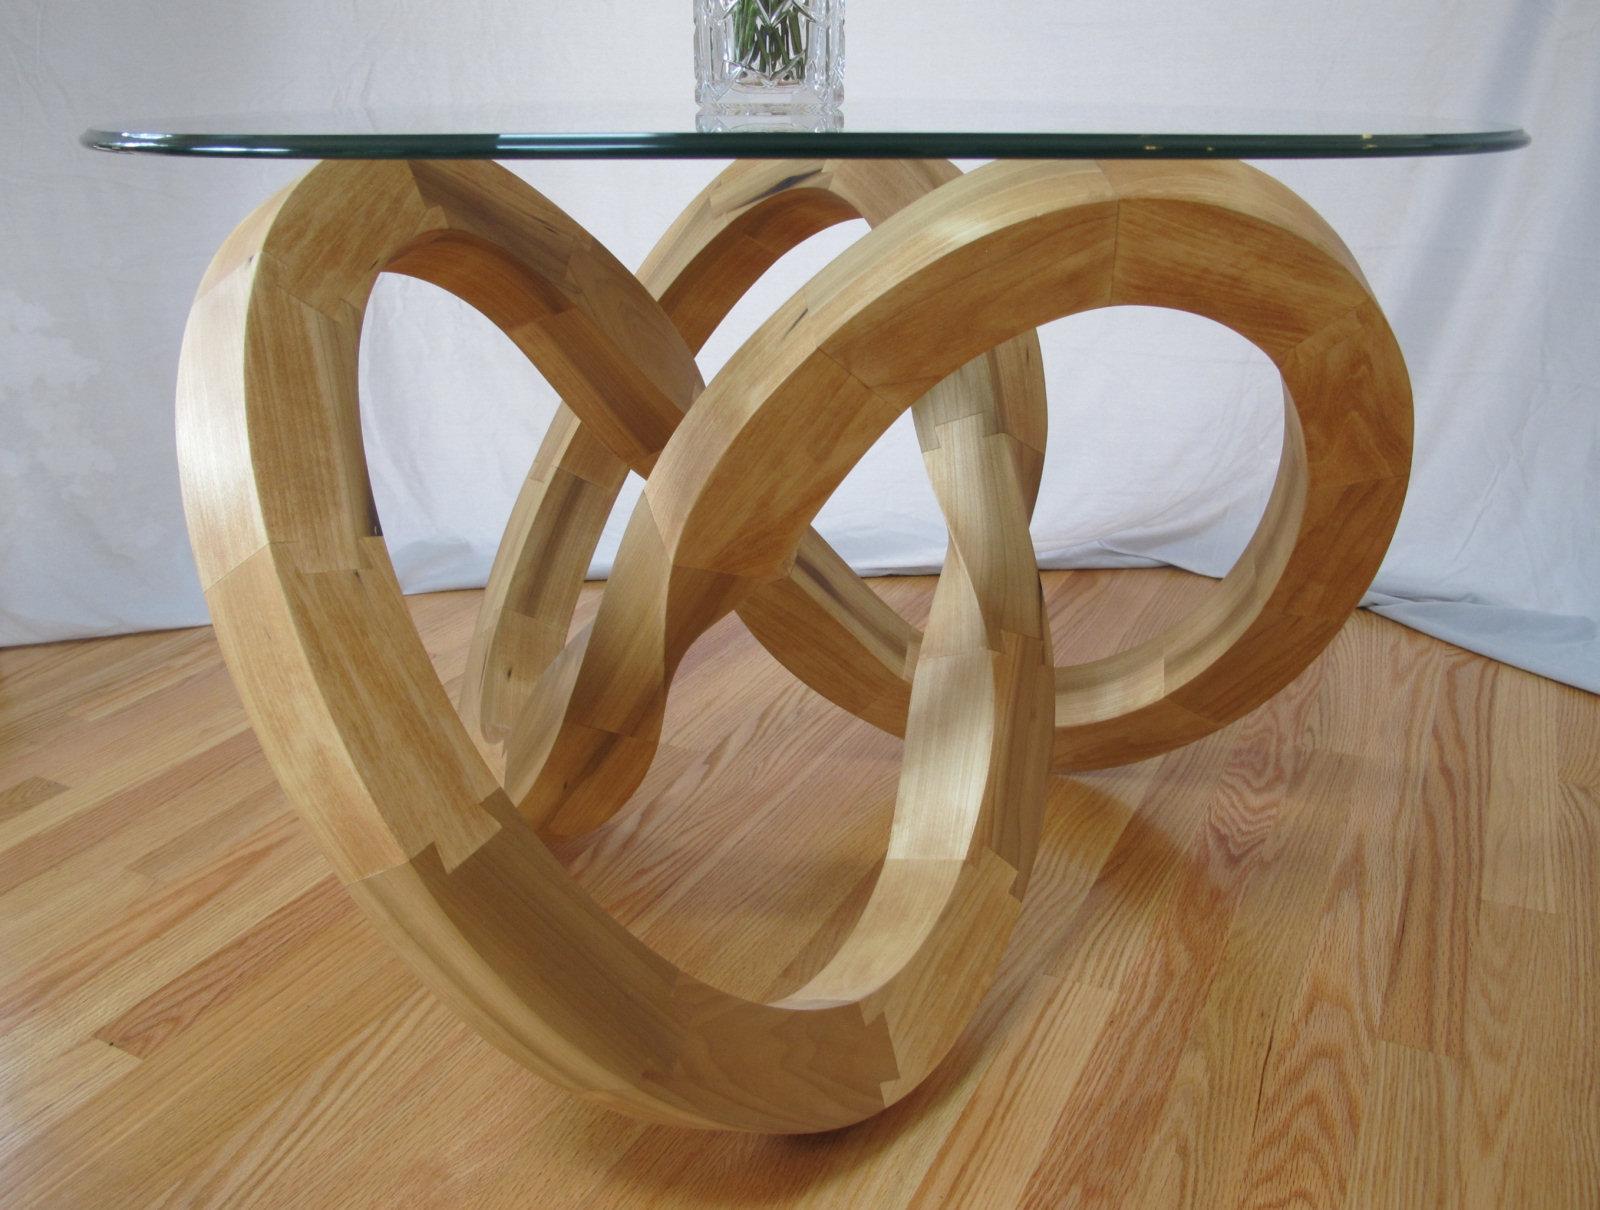 Digital Fabrication For Designers Torus Knot Table